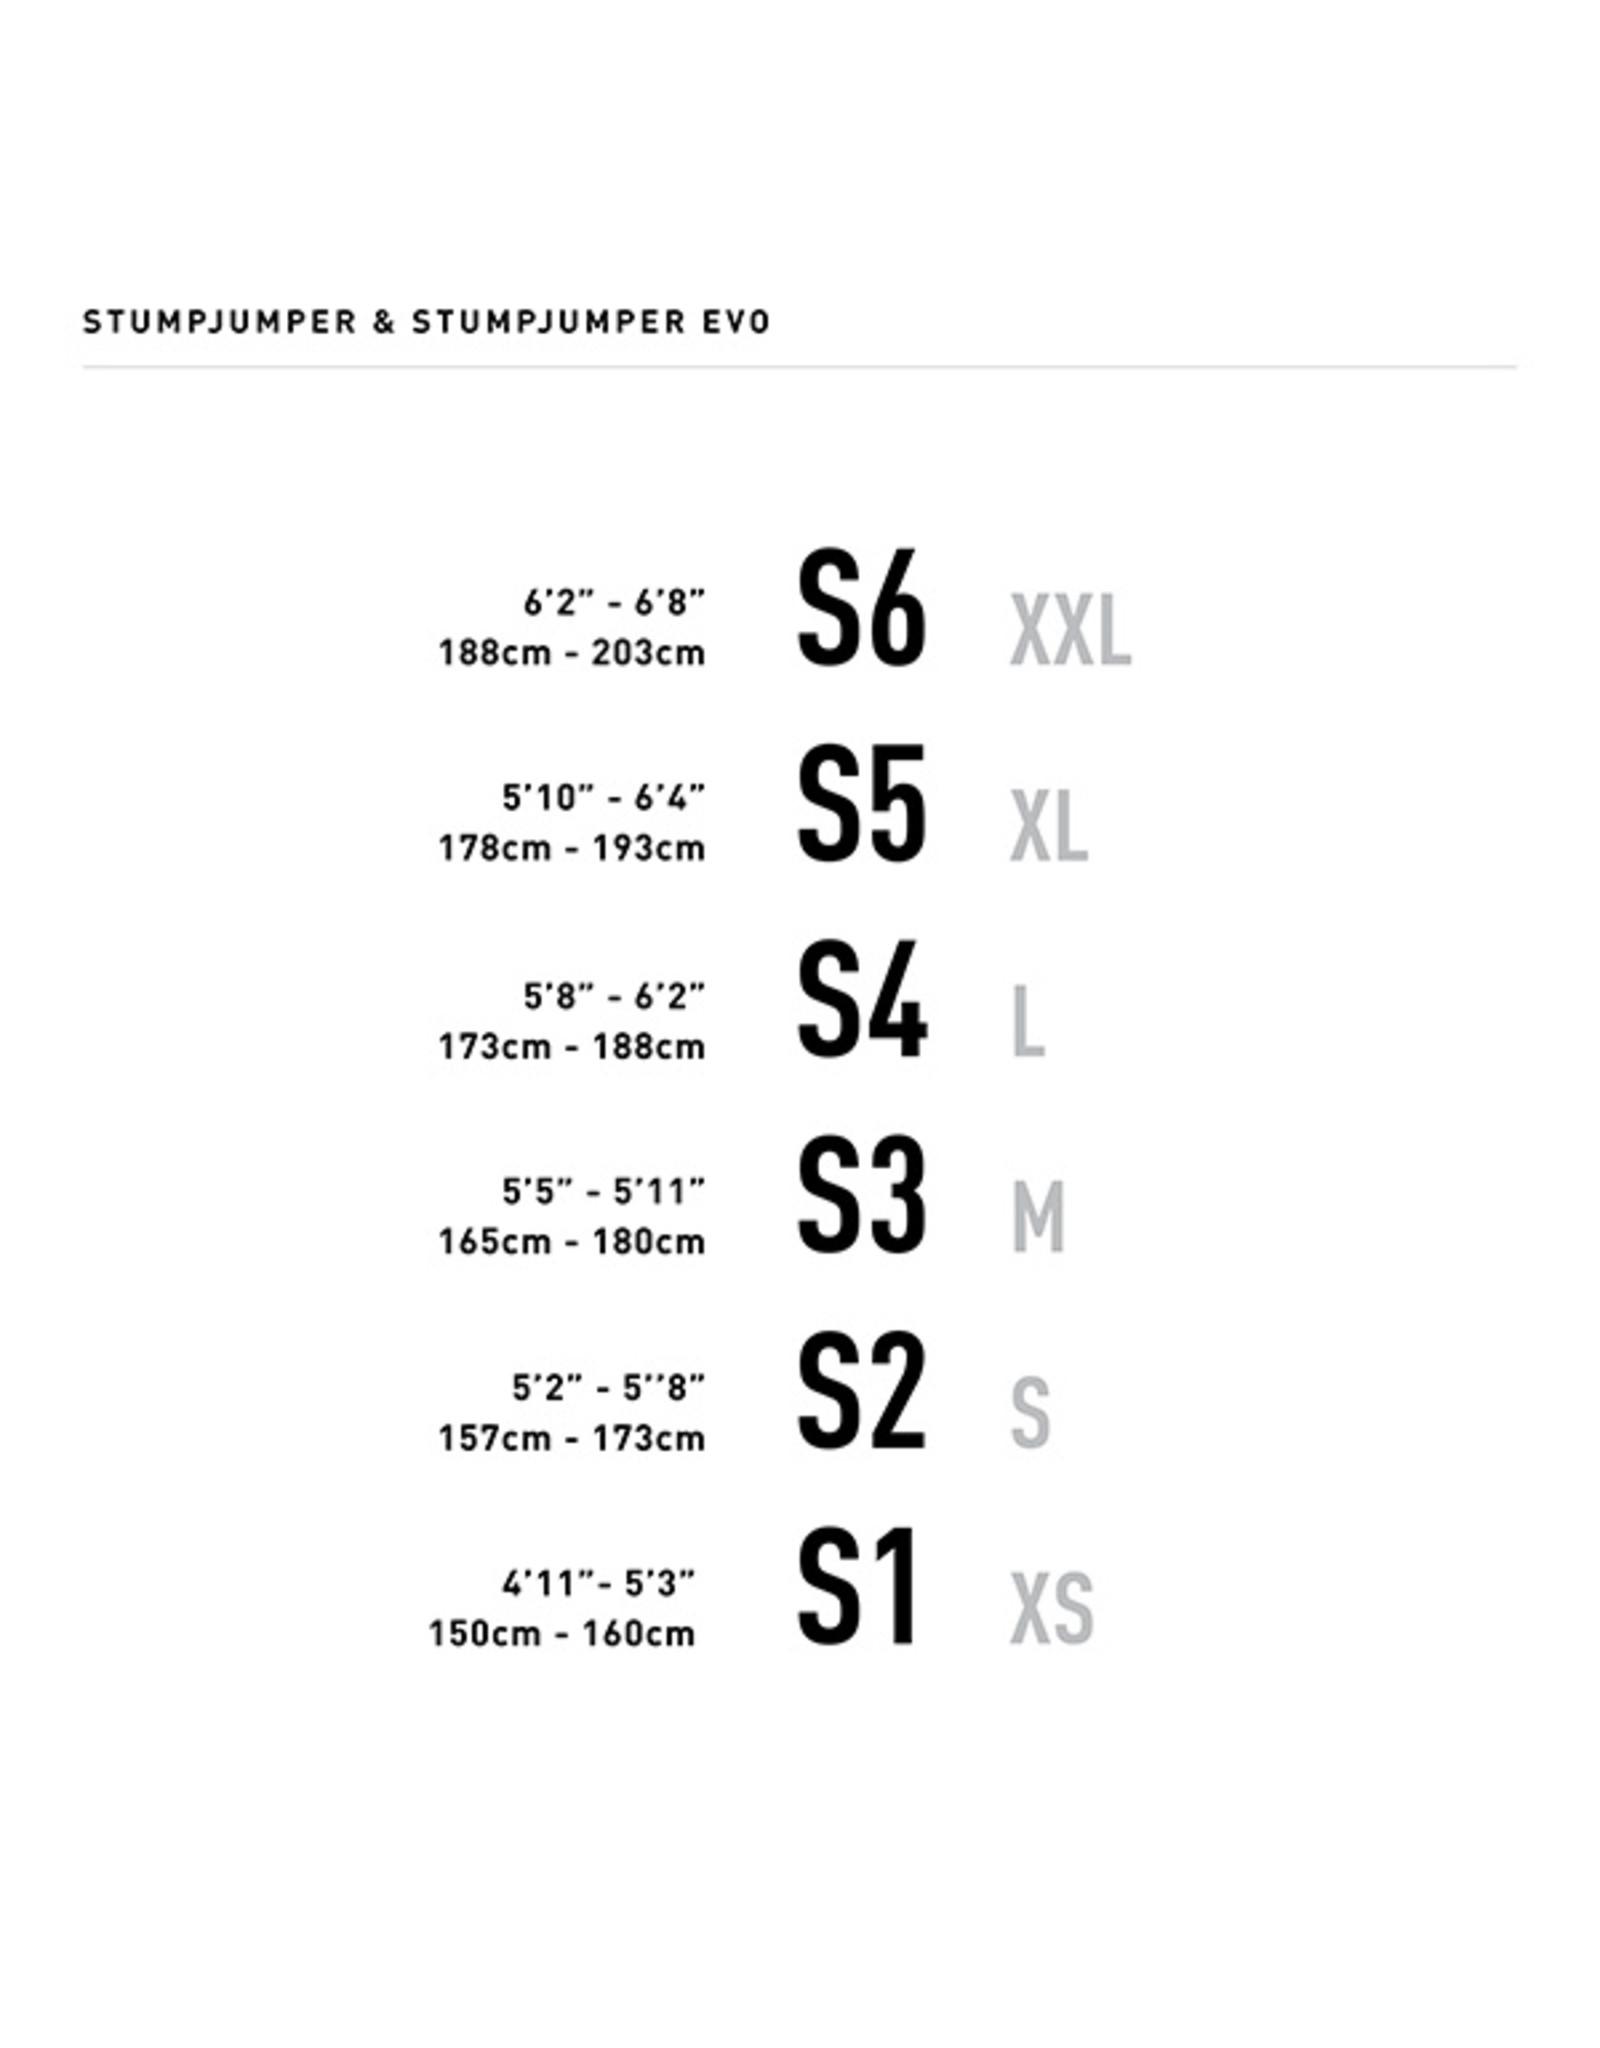 SPECIALIZED Specialized Stumpjumper Evo Comp Doppio/Sand S4